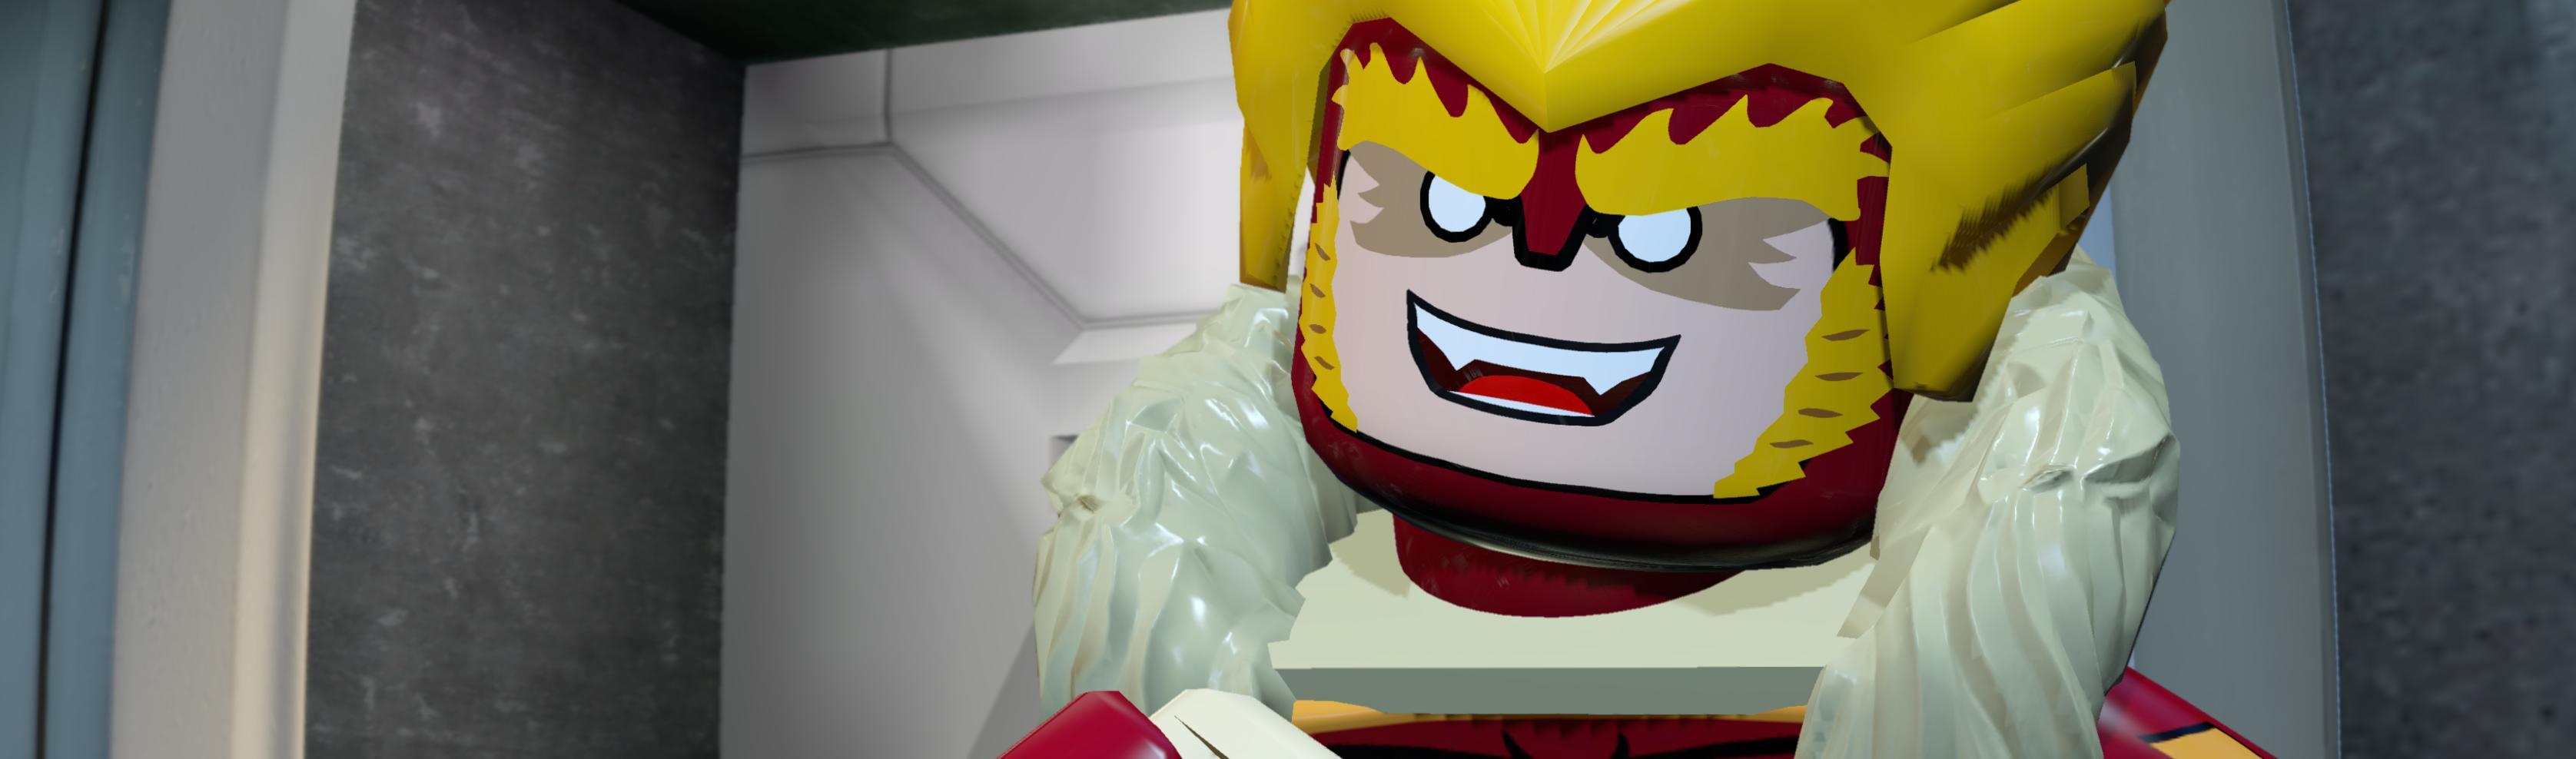 LegoMarvel (10)